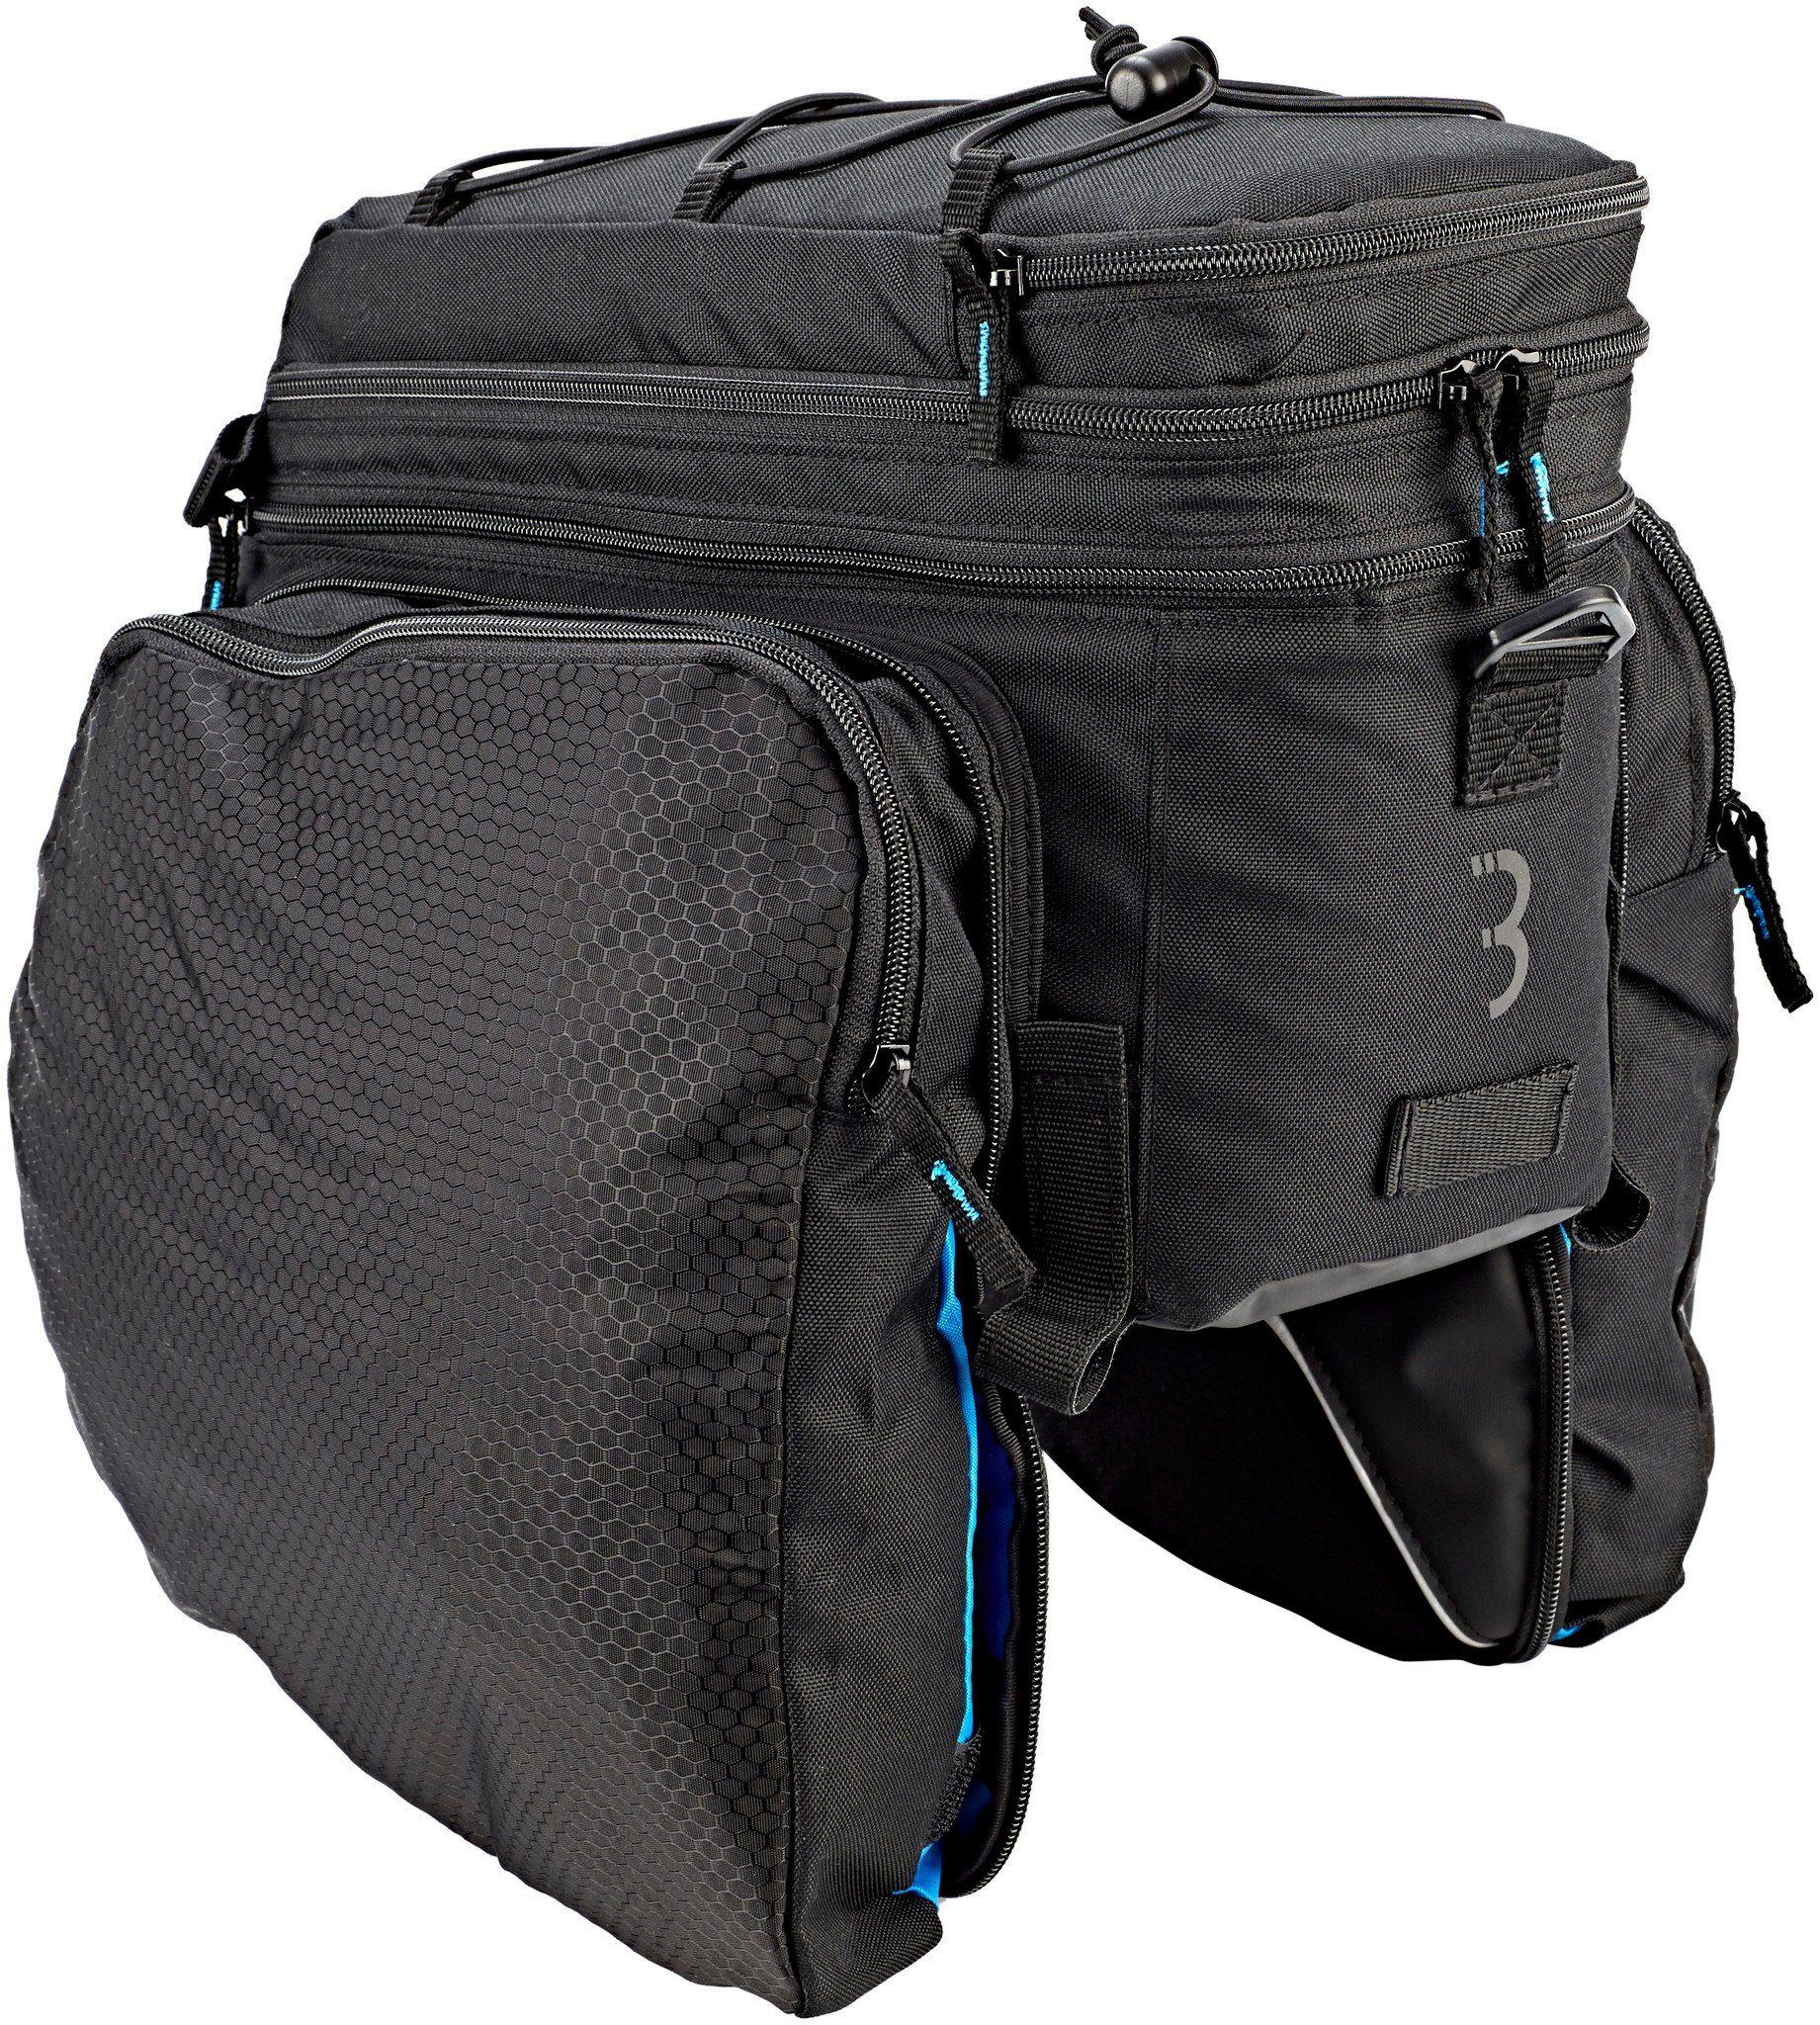 BBB Gepäckträgertasche »TrunckPack BSB-133 Tasche für Gepackträger«